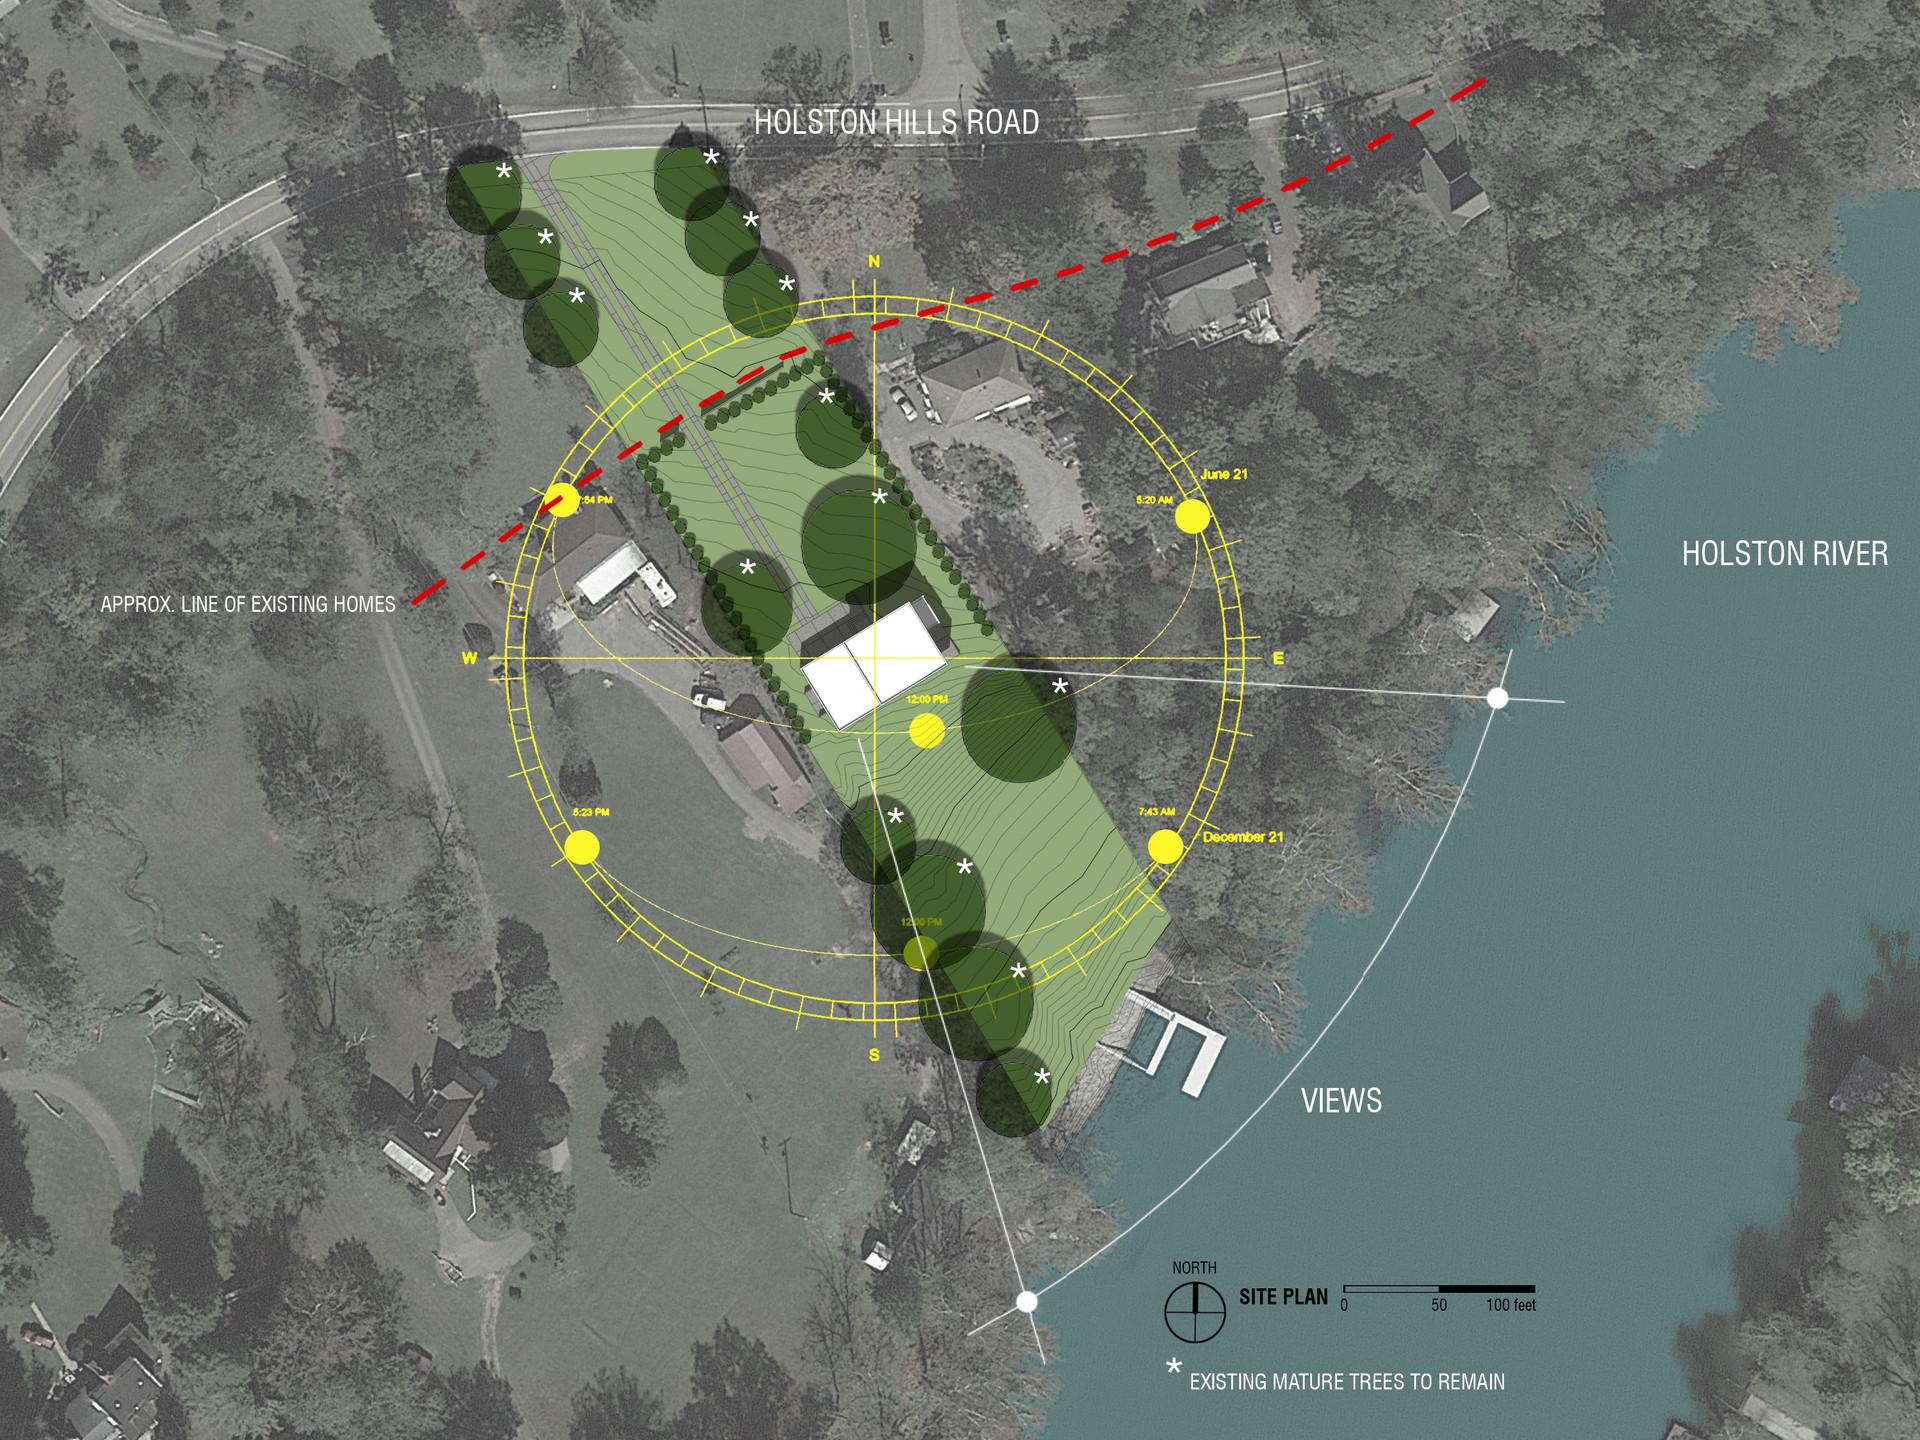 Site plan, views, solar orientation study